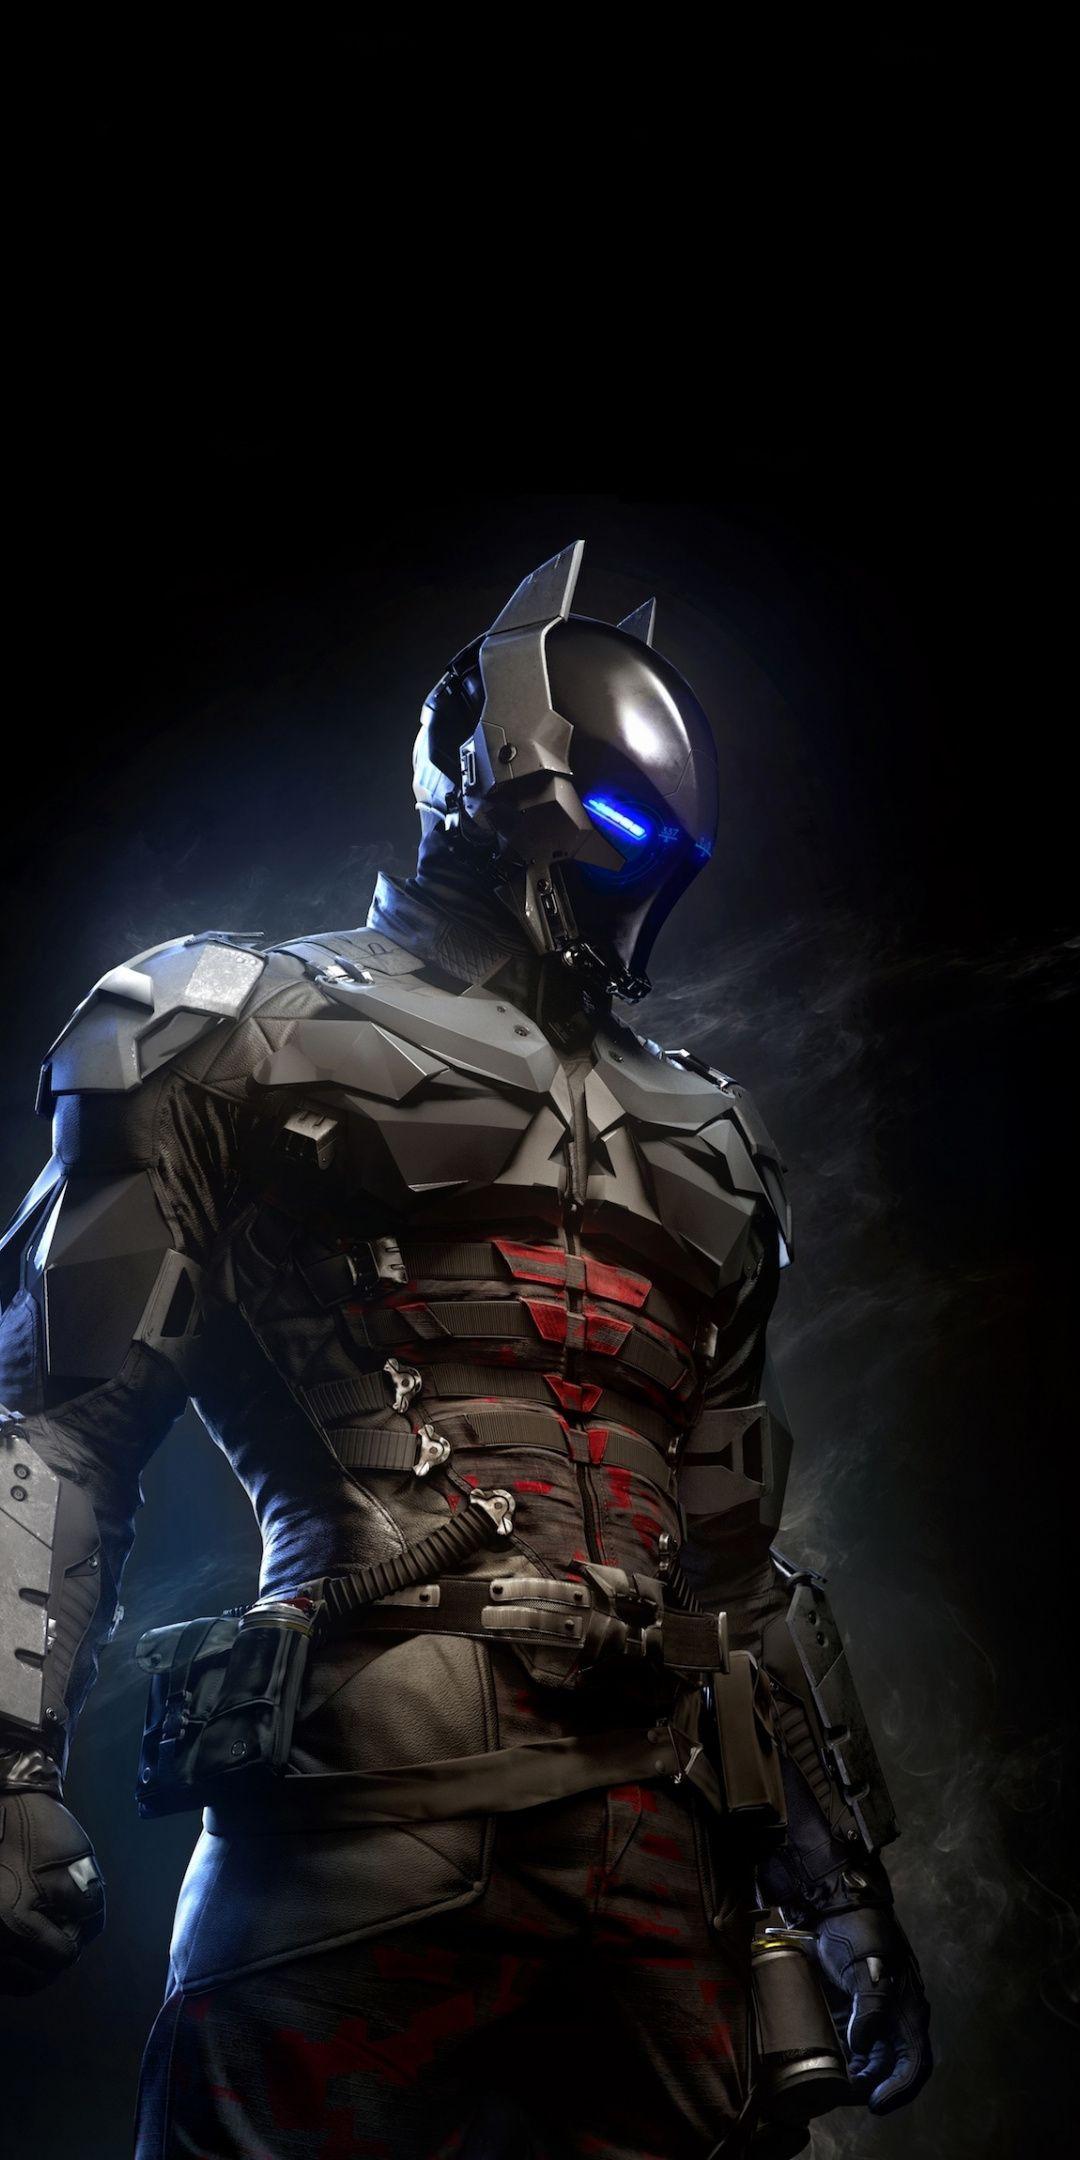 Armour Suit Batman Arkham Knight Superhero 1080x2160 Wallpaper Batman Wallpaper Batman Wallpaper Iphone Marvel Wallpaper Hd